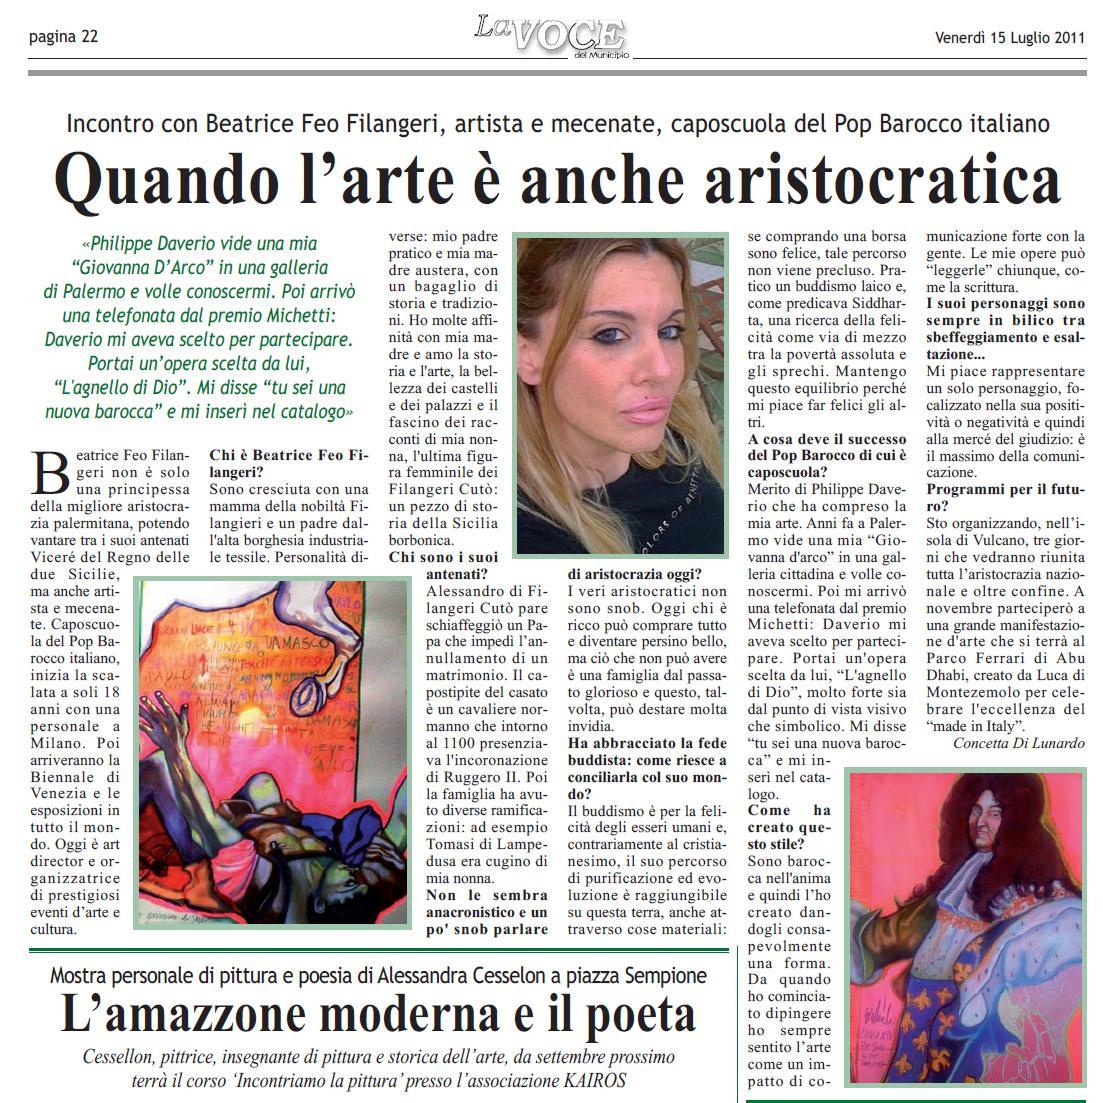 Feo_Filangero1